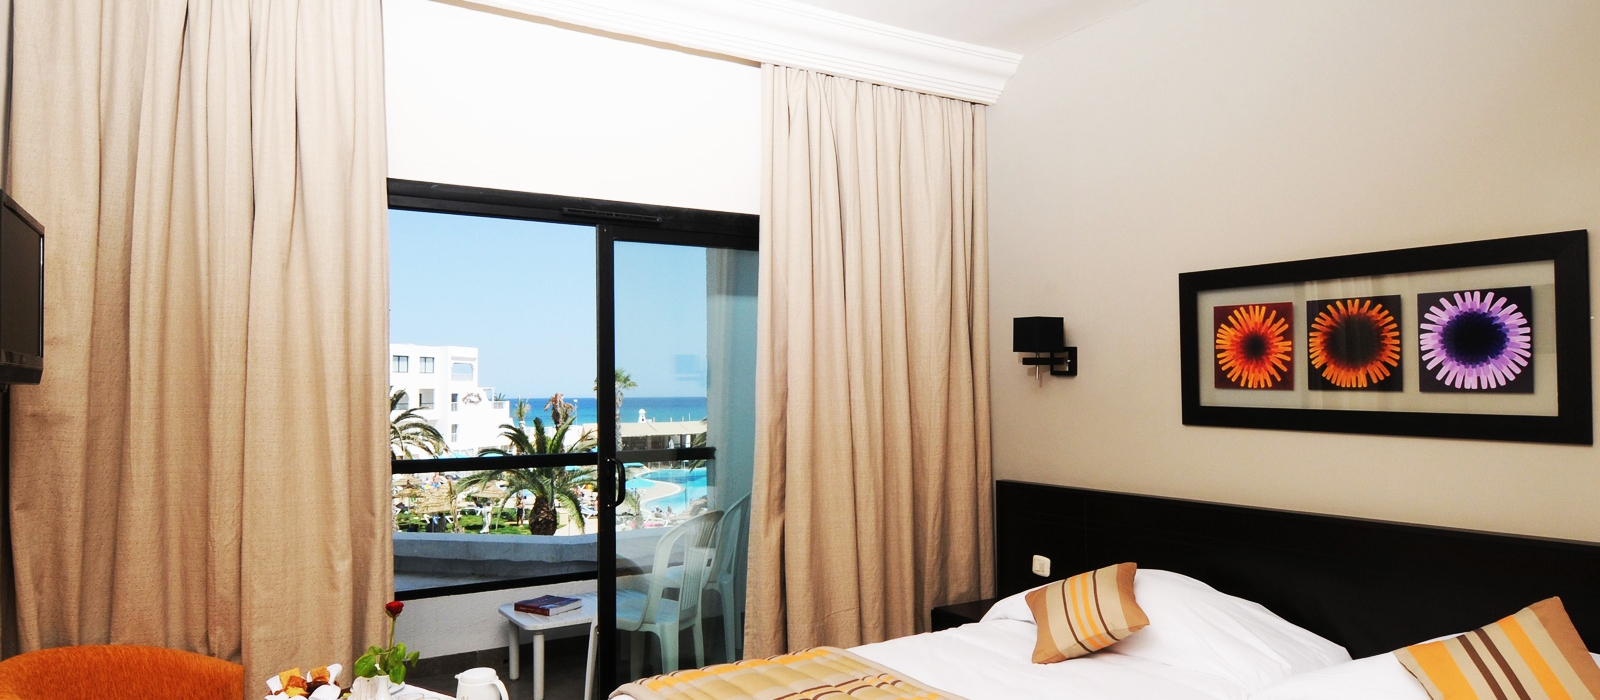 Chambres Hôtel Vincci Nozha Beach Hammamet - Double Chambre avec vue mer